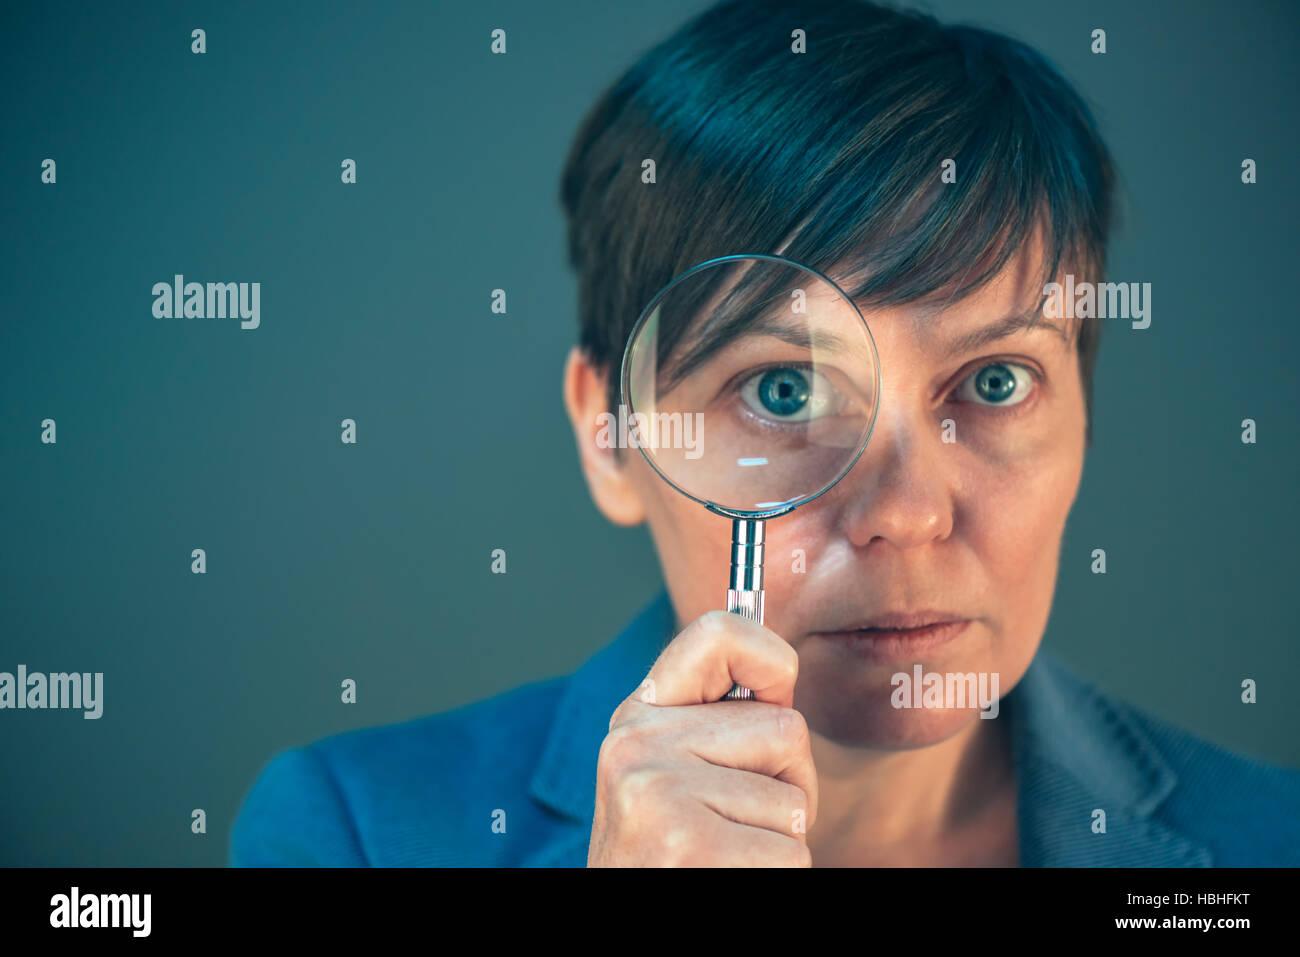 Belle businesswoman looking through magnifying glass - rechercher, découvrir, explorer, étudier et analyser Photo Stock